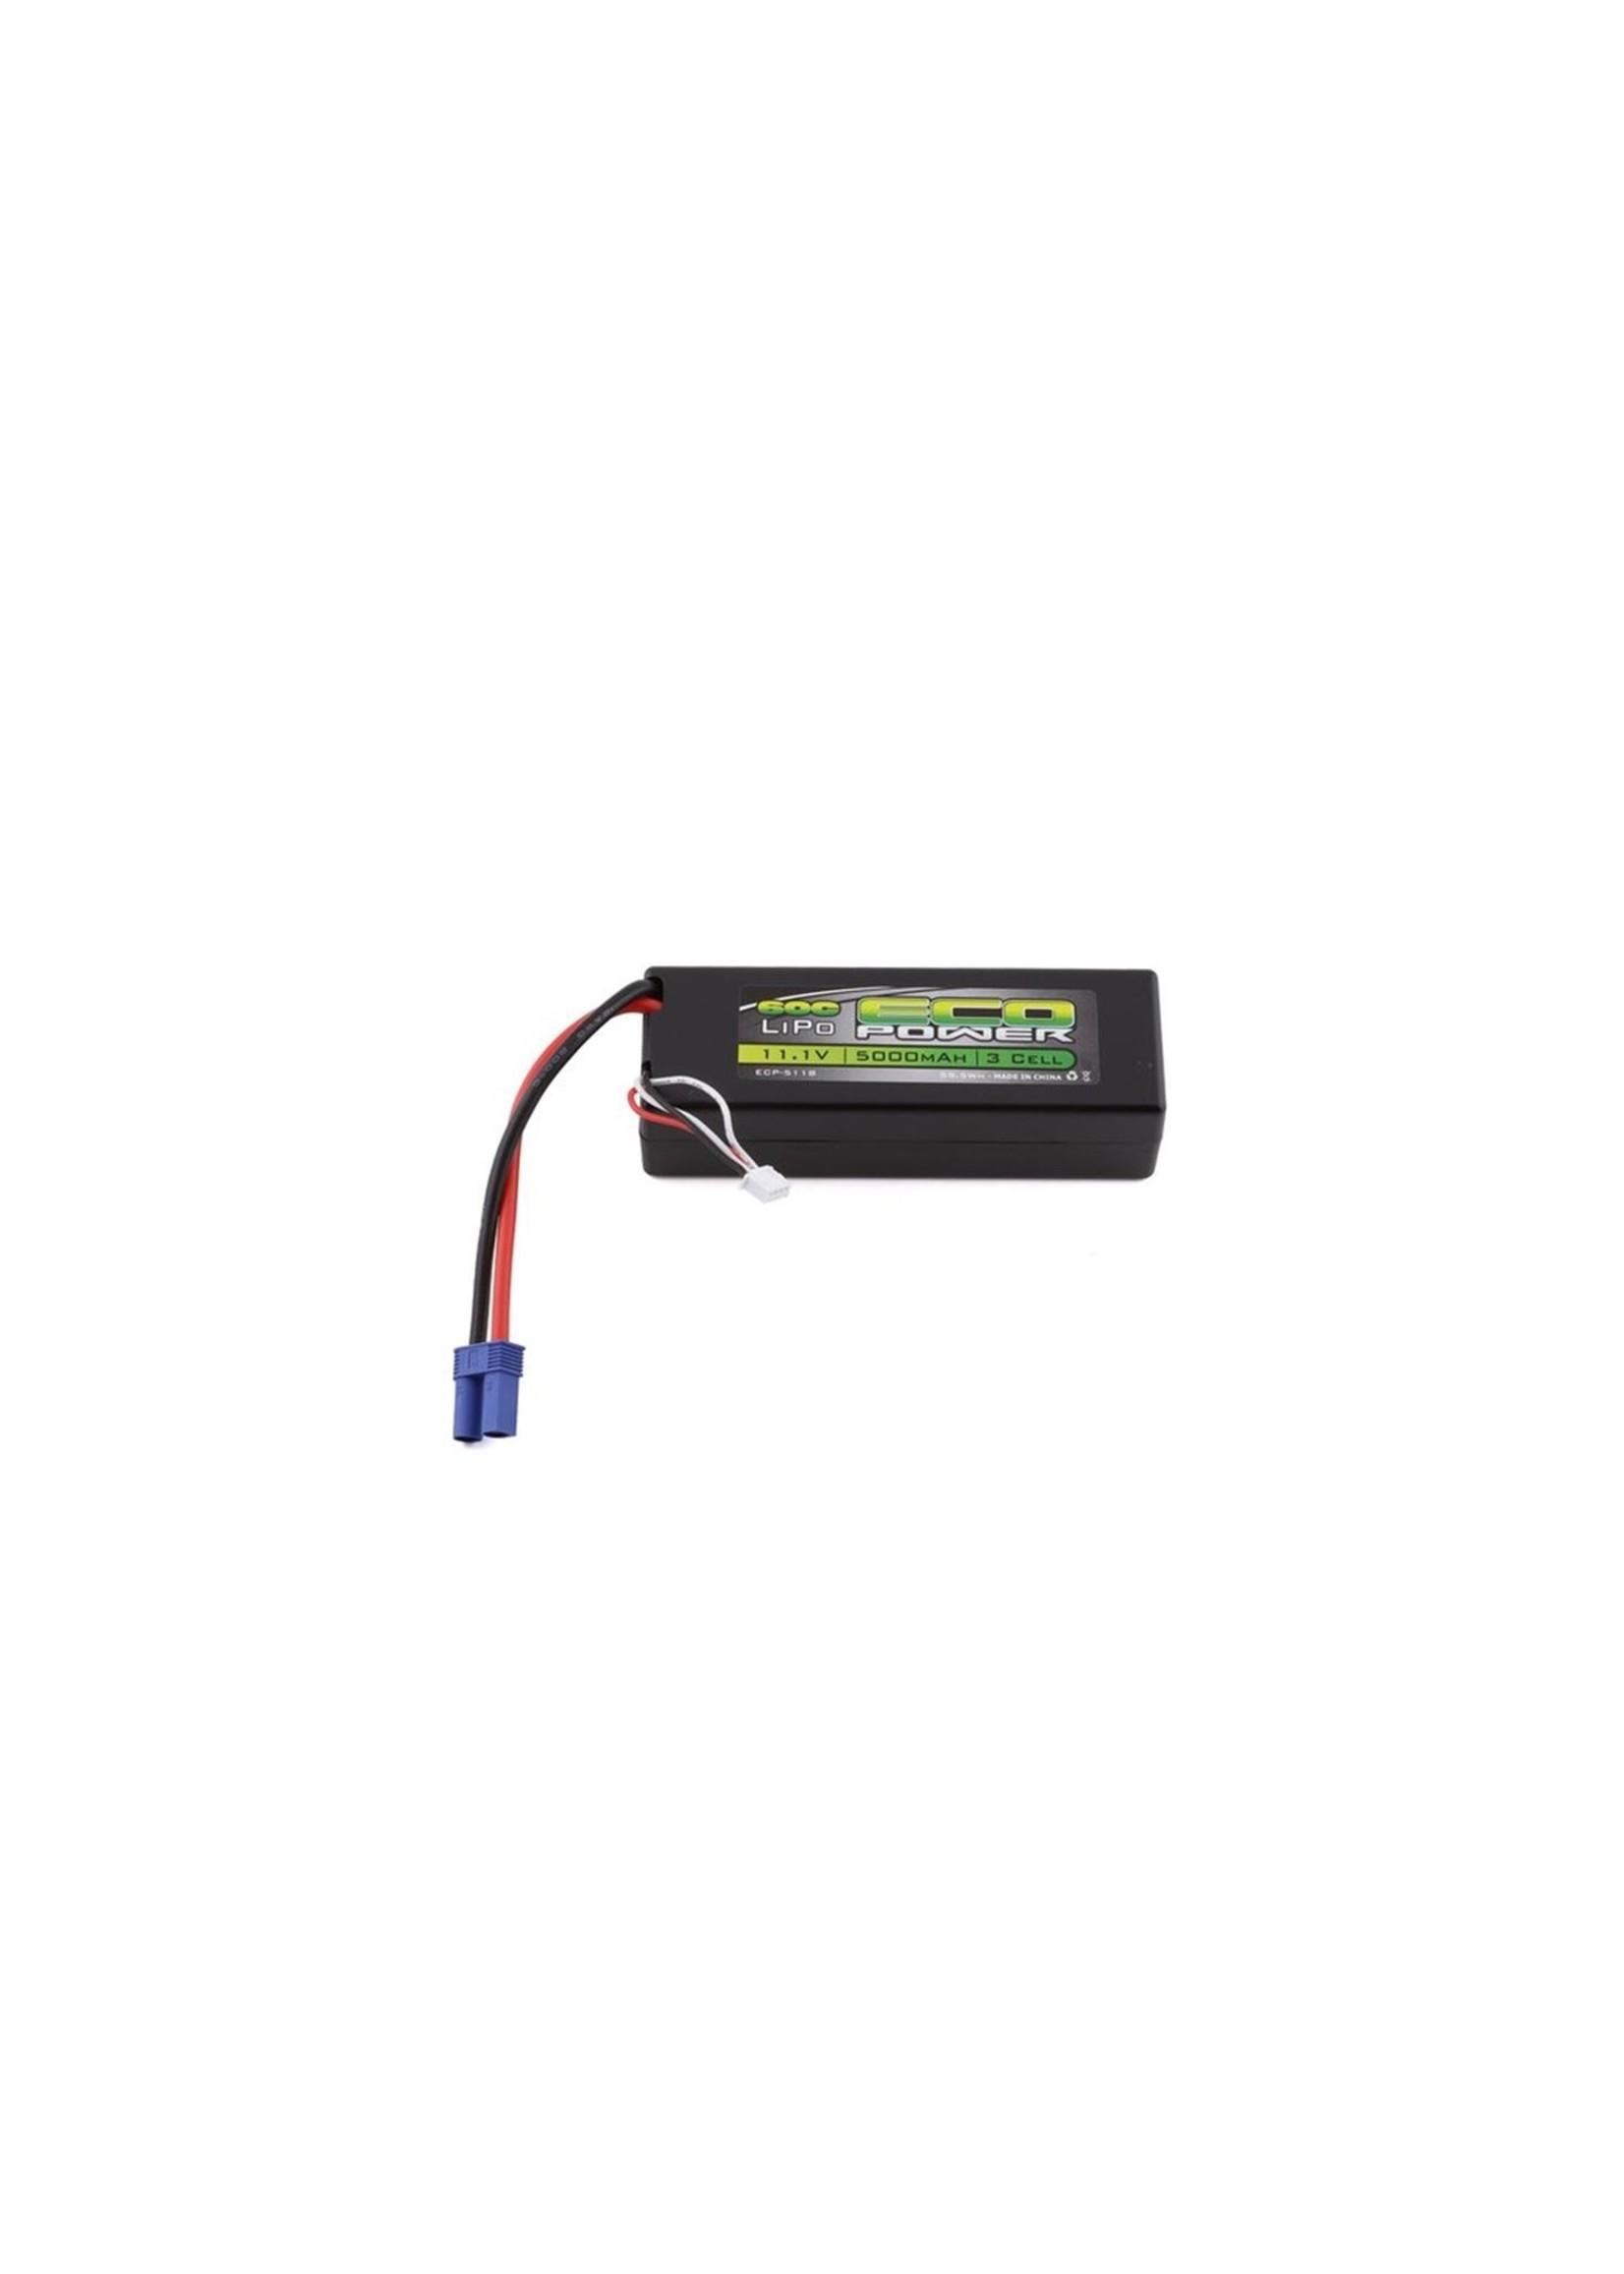 "EcoPower ECP-5118 EcoPower ""Basher"" 3S 60C Hard Case LiPo Battery w/EC5 (11.1V/5000mAh)"